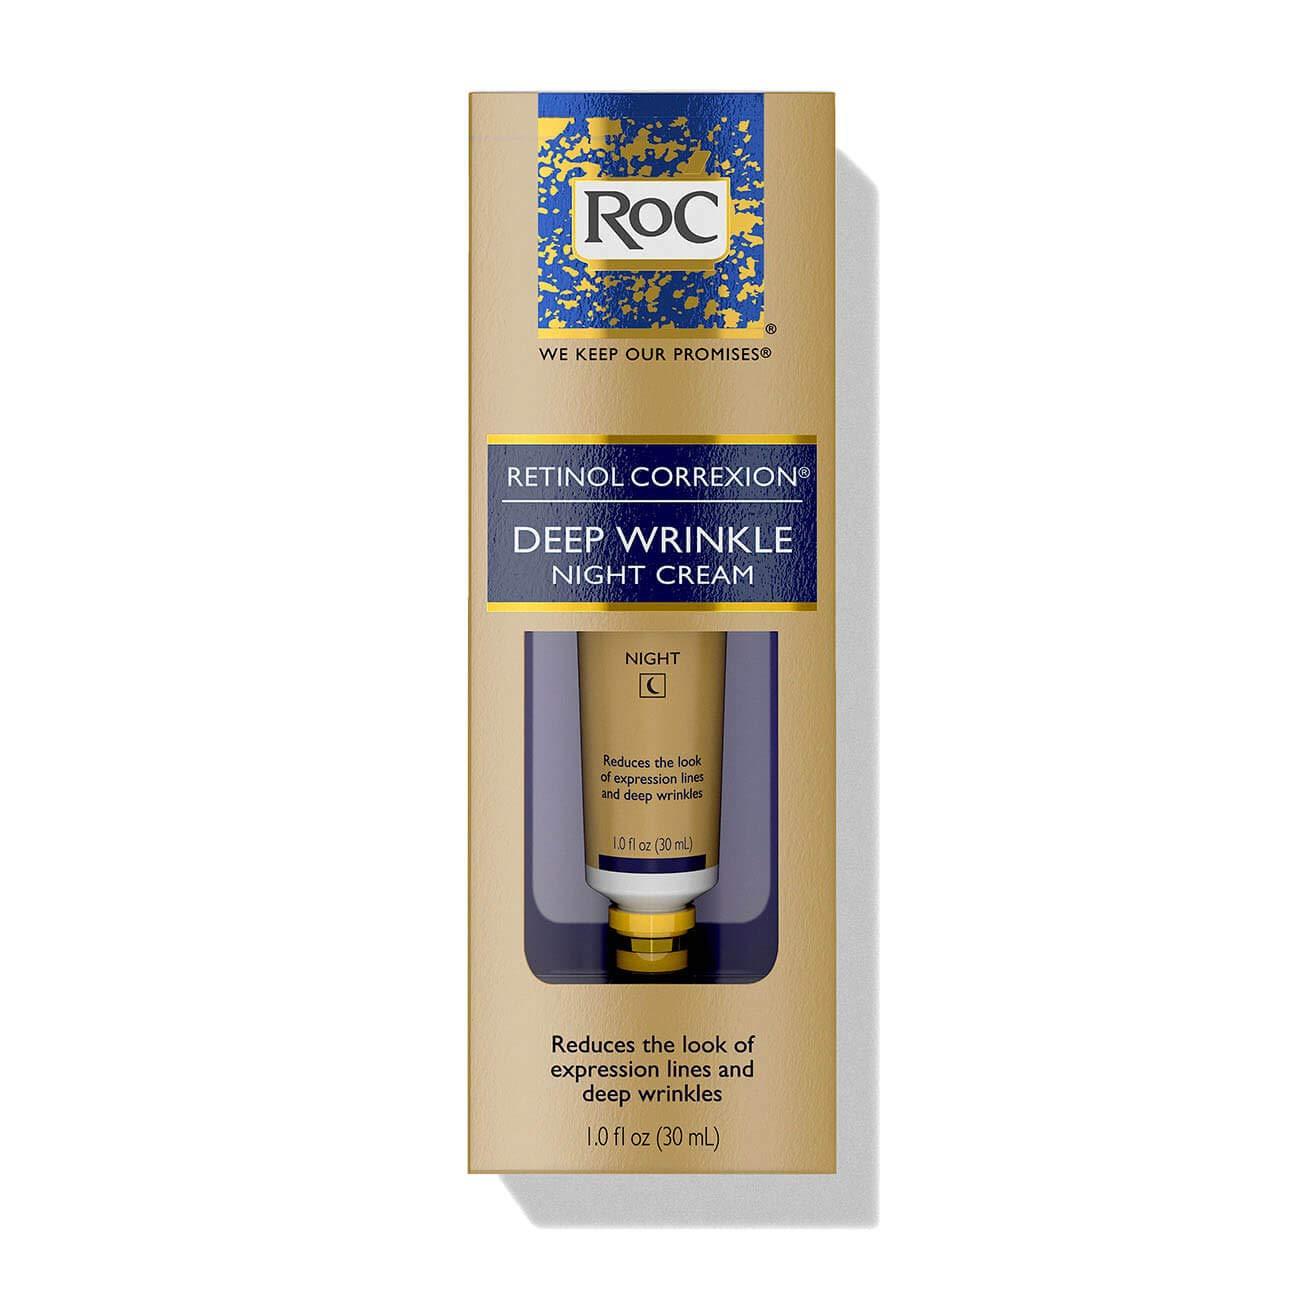 RoC Retinol Correxion Deep Wrinkle Night Cream 1.1 fl. oz (33ml) by RoC